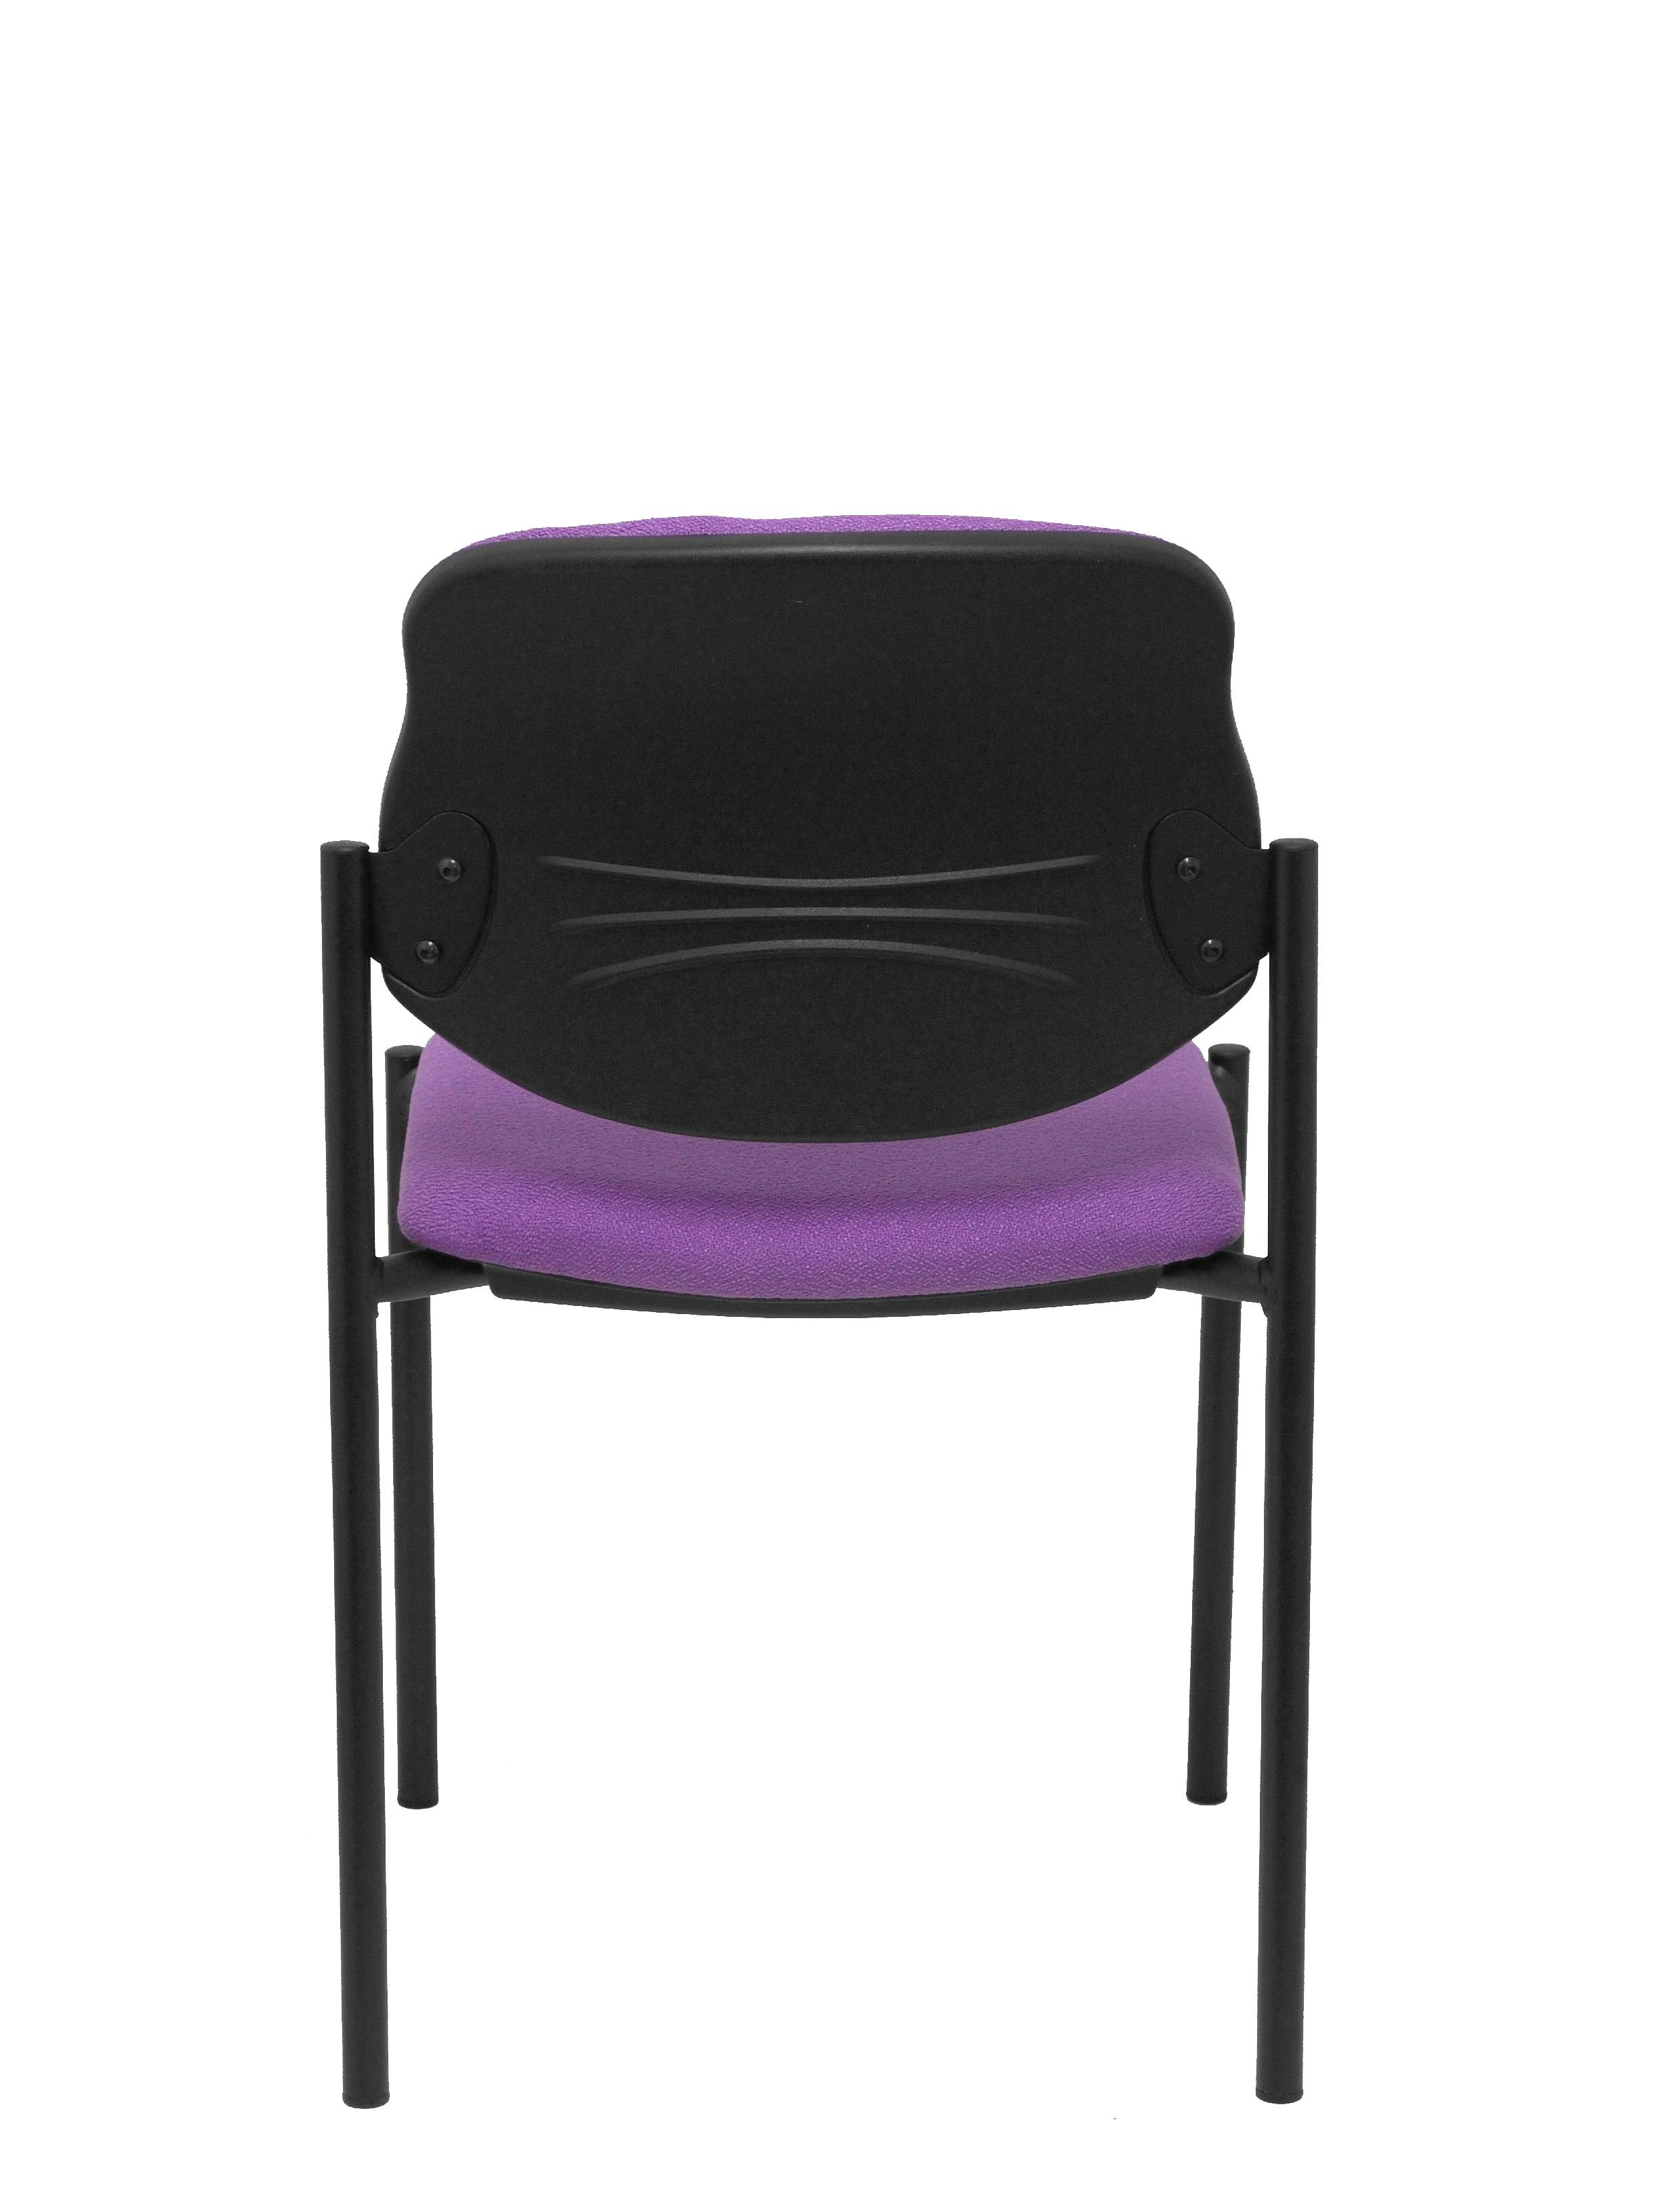 Stuhl befestigt Villalgordo bali fliederfarbenes Gestell